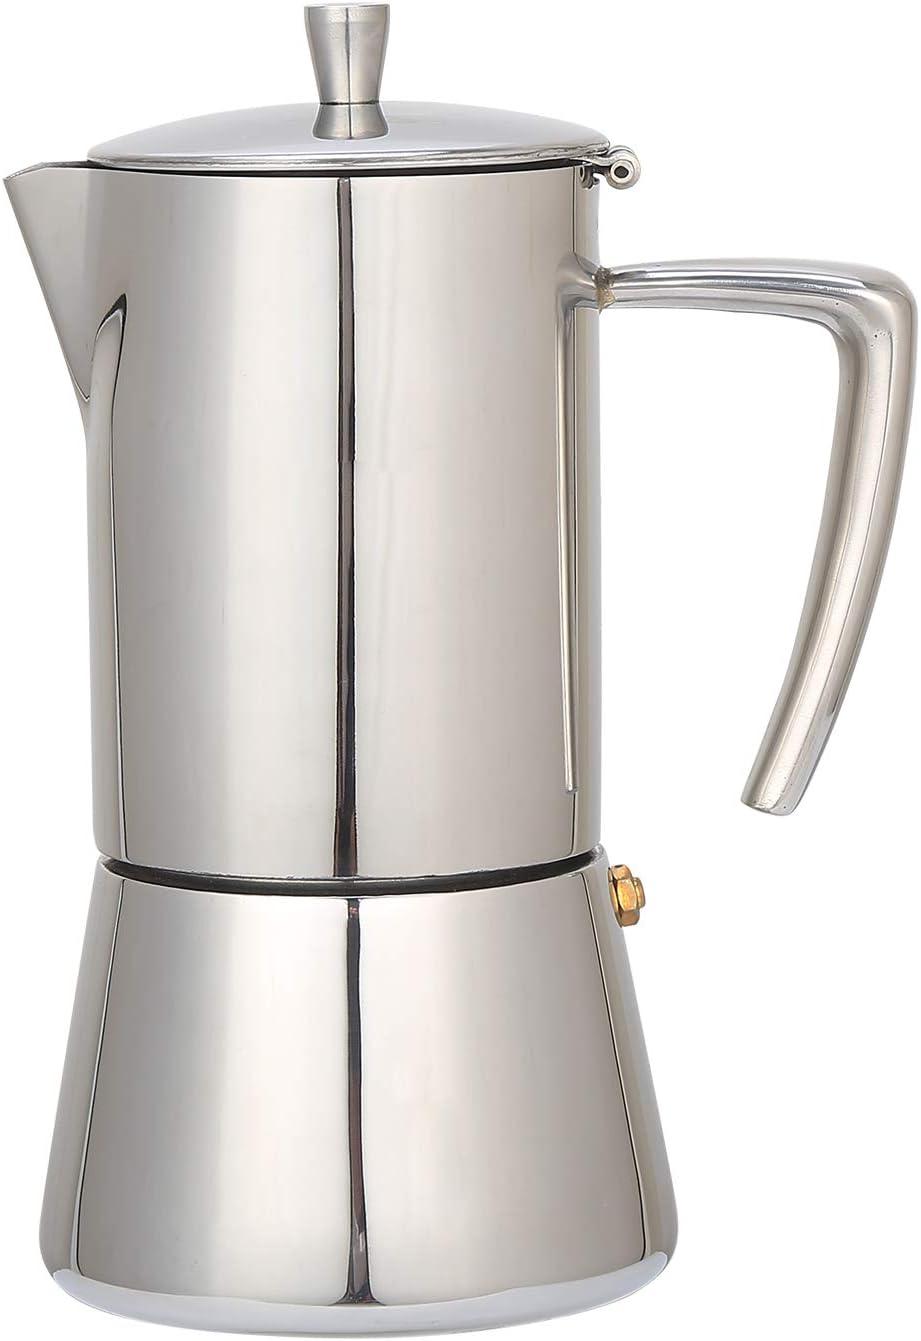 Luxurious Italian Coffee Machine Maker Stainless Steel Espresso Maker Full Bodied Coffee Renewed Espresso Pot For 5-6 Cups bonVIVO Intenca Stovetop Espresso Maker 10 oz Moka Pot Copper Chrome Finish